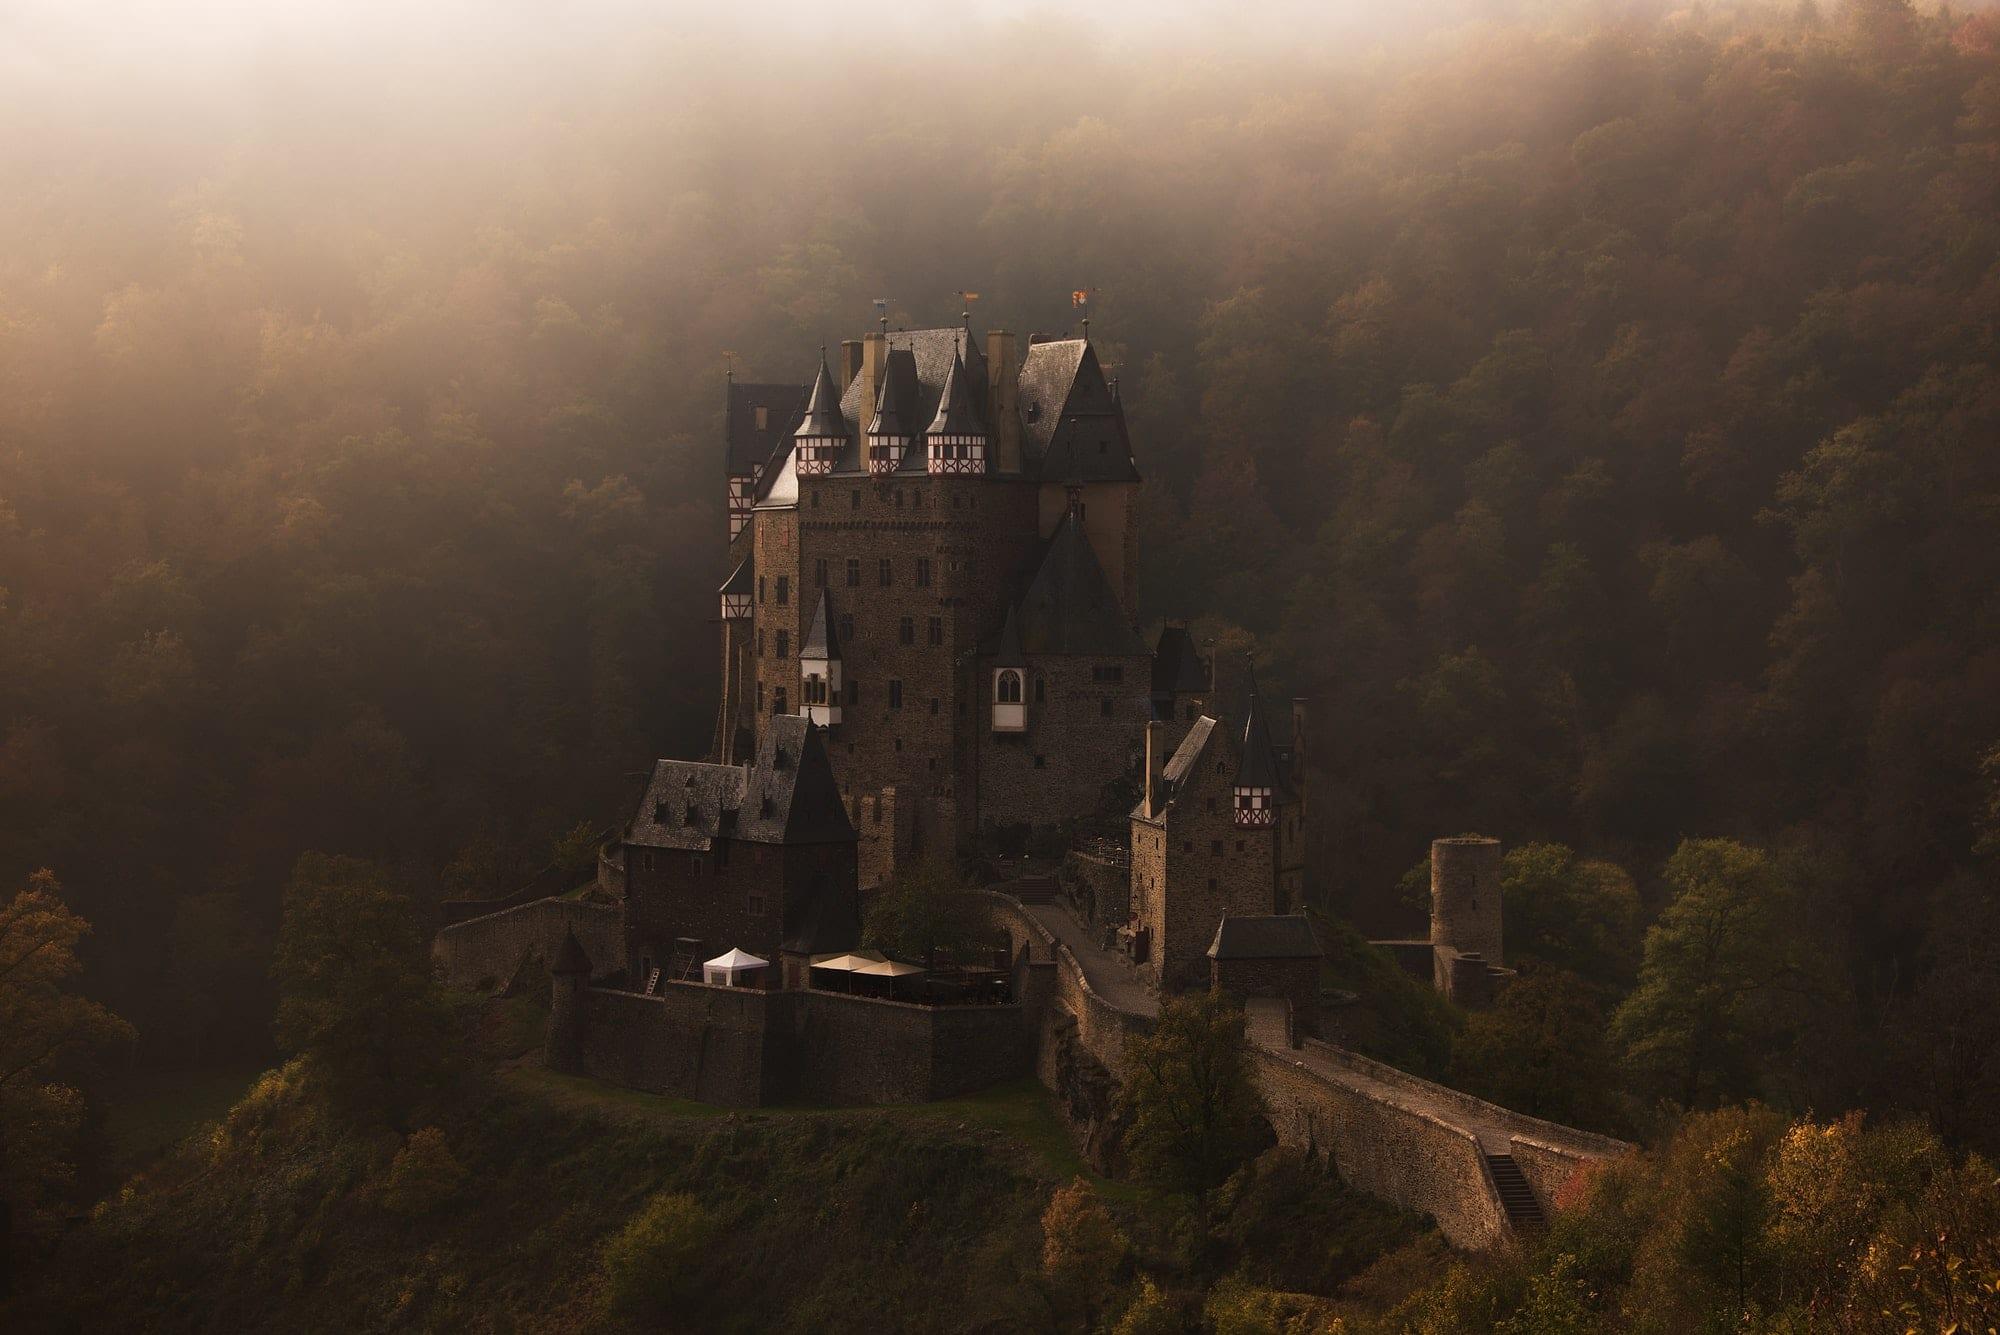 Burg Eltz castle in the early morning fog